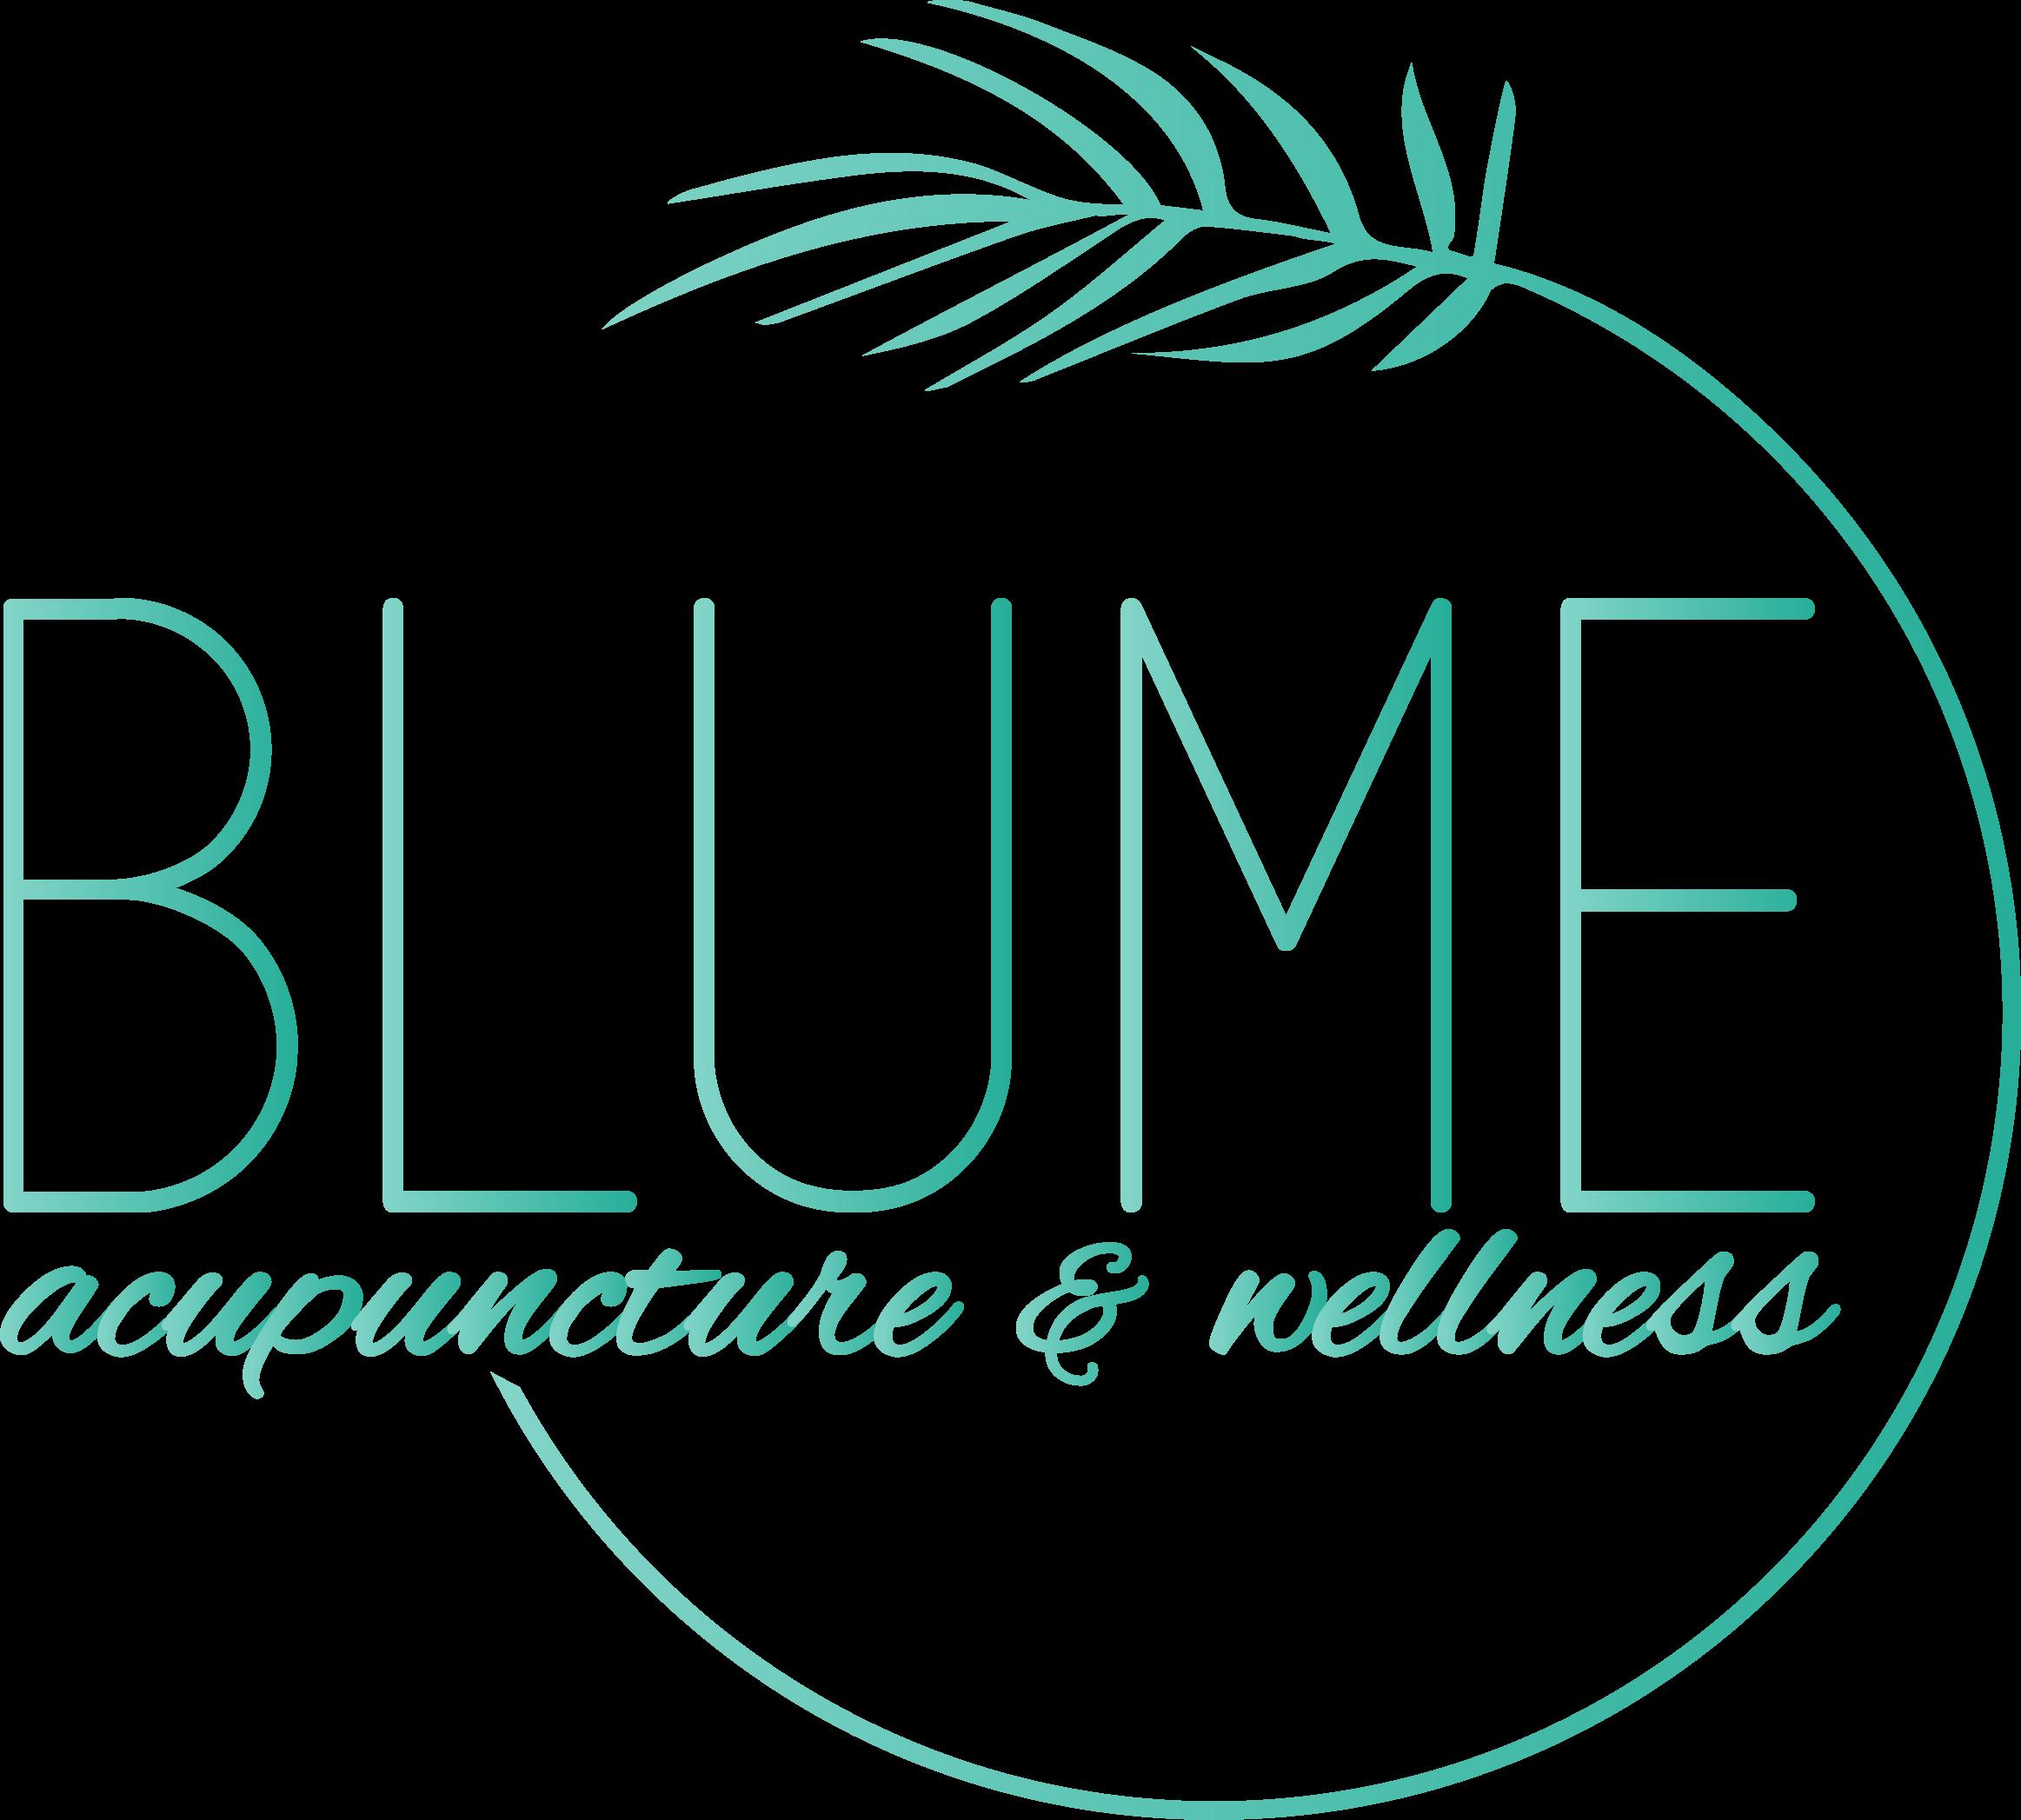 Blume Acupuncture & Wellness